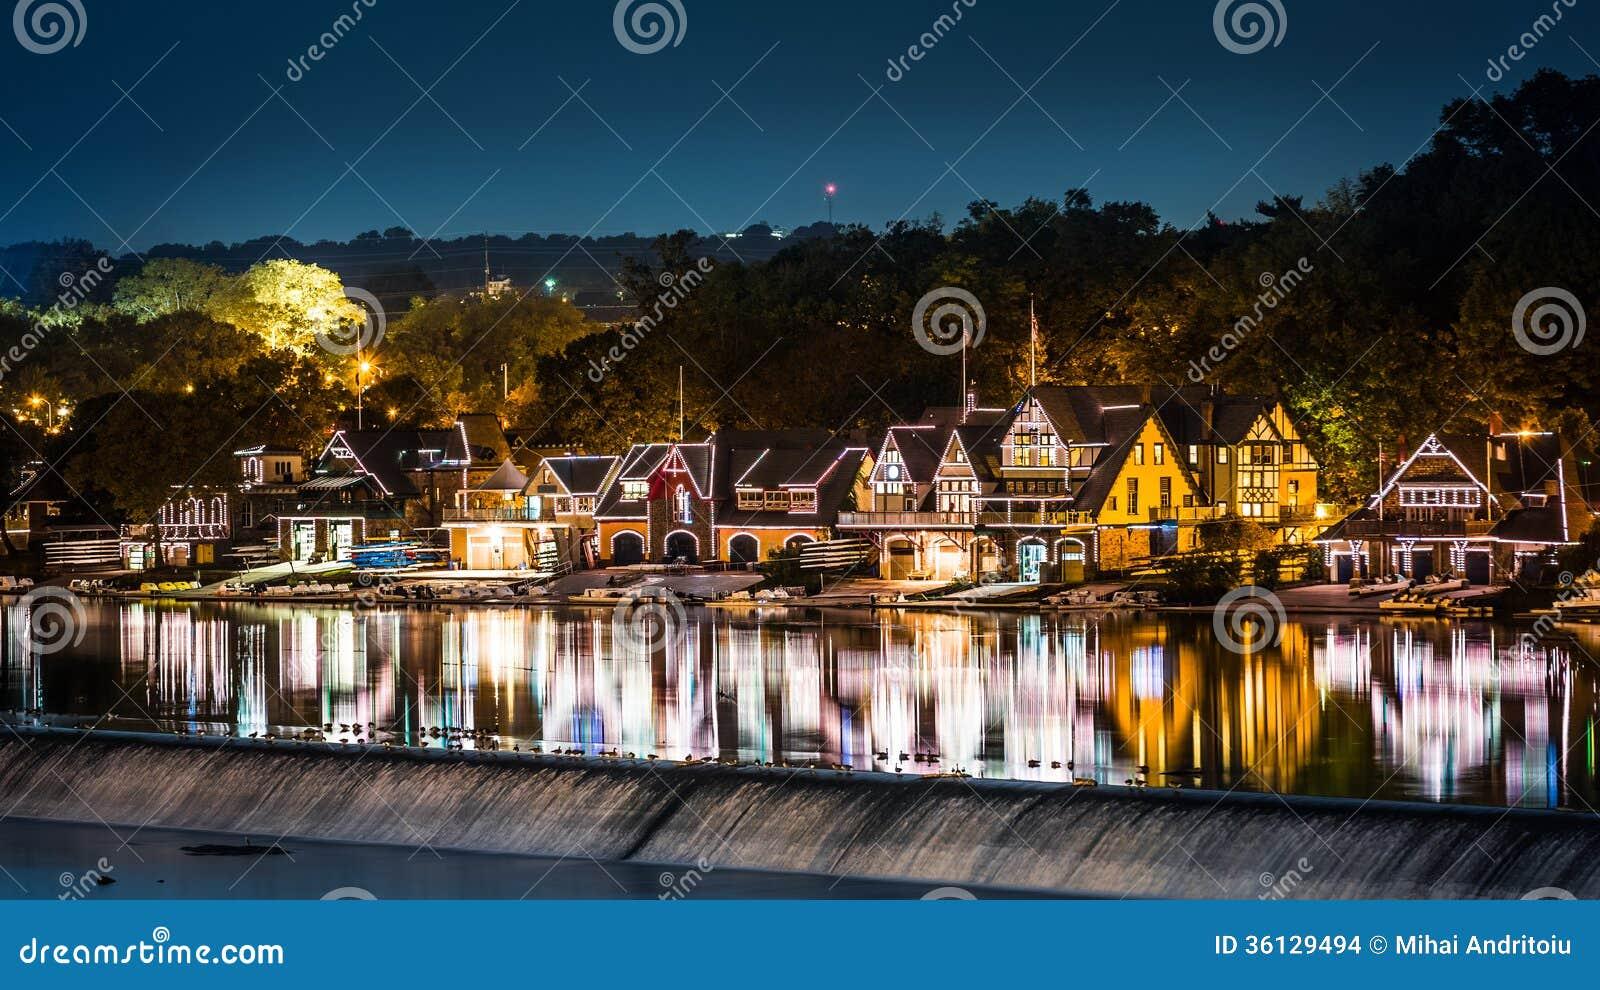 Philadelphia Boathouse Row By Night Stock Photo - Image of lights ...